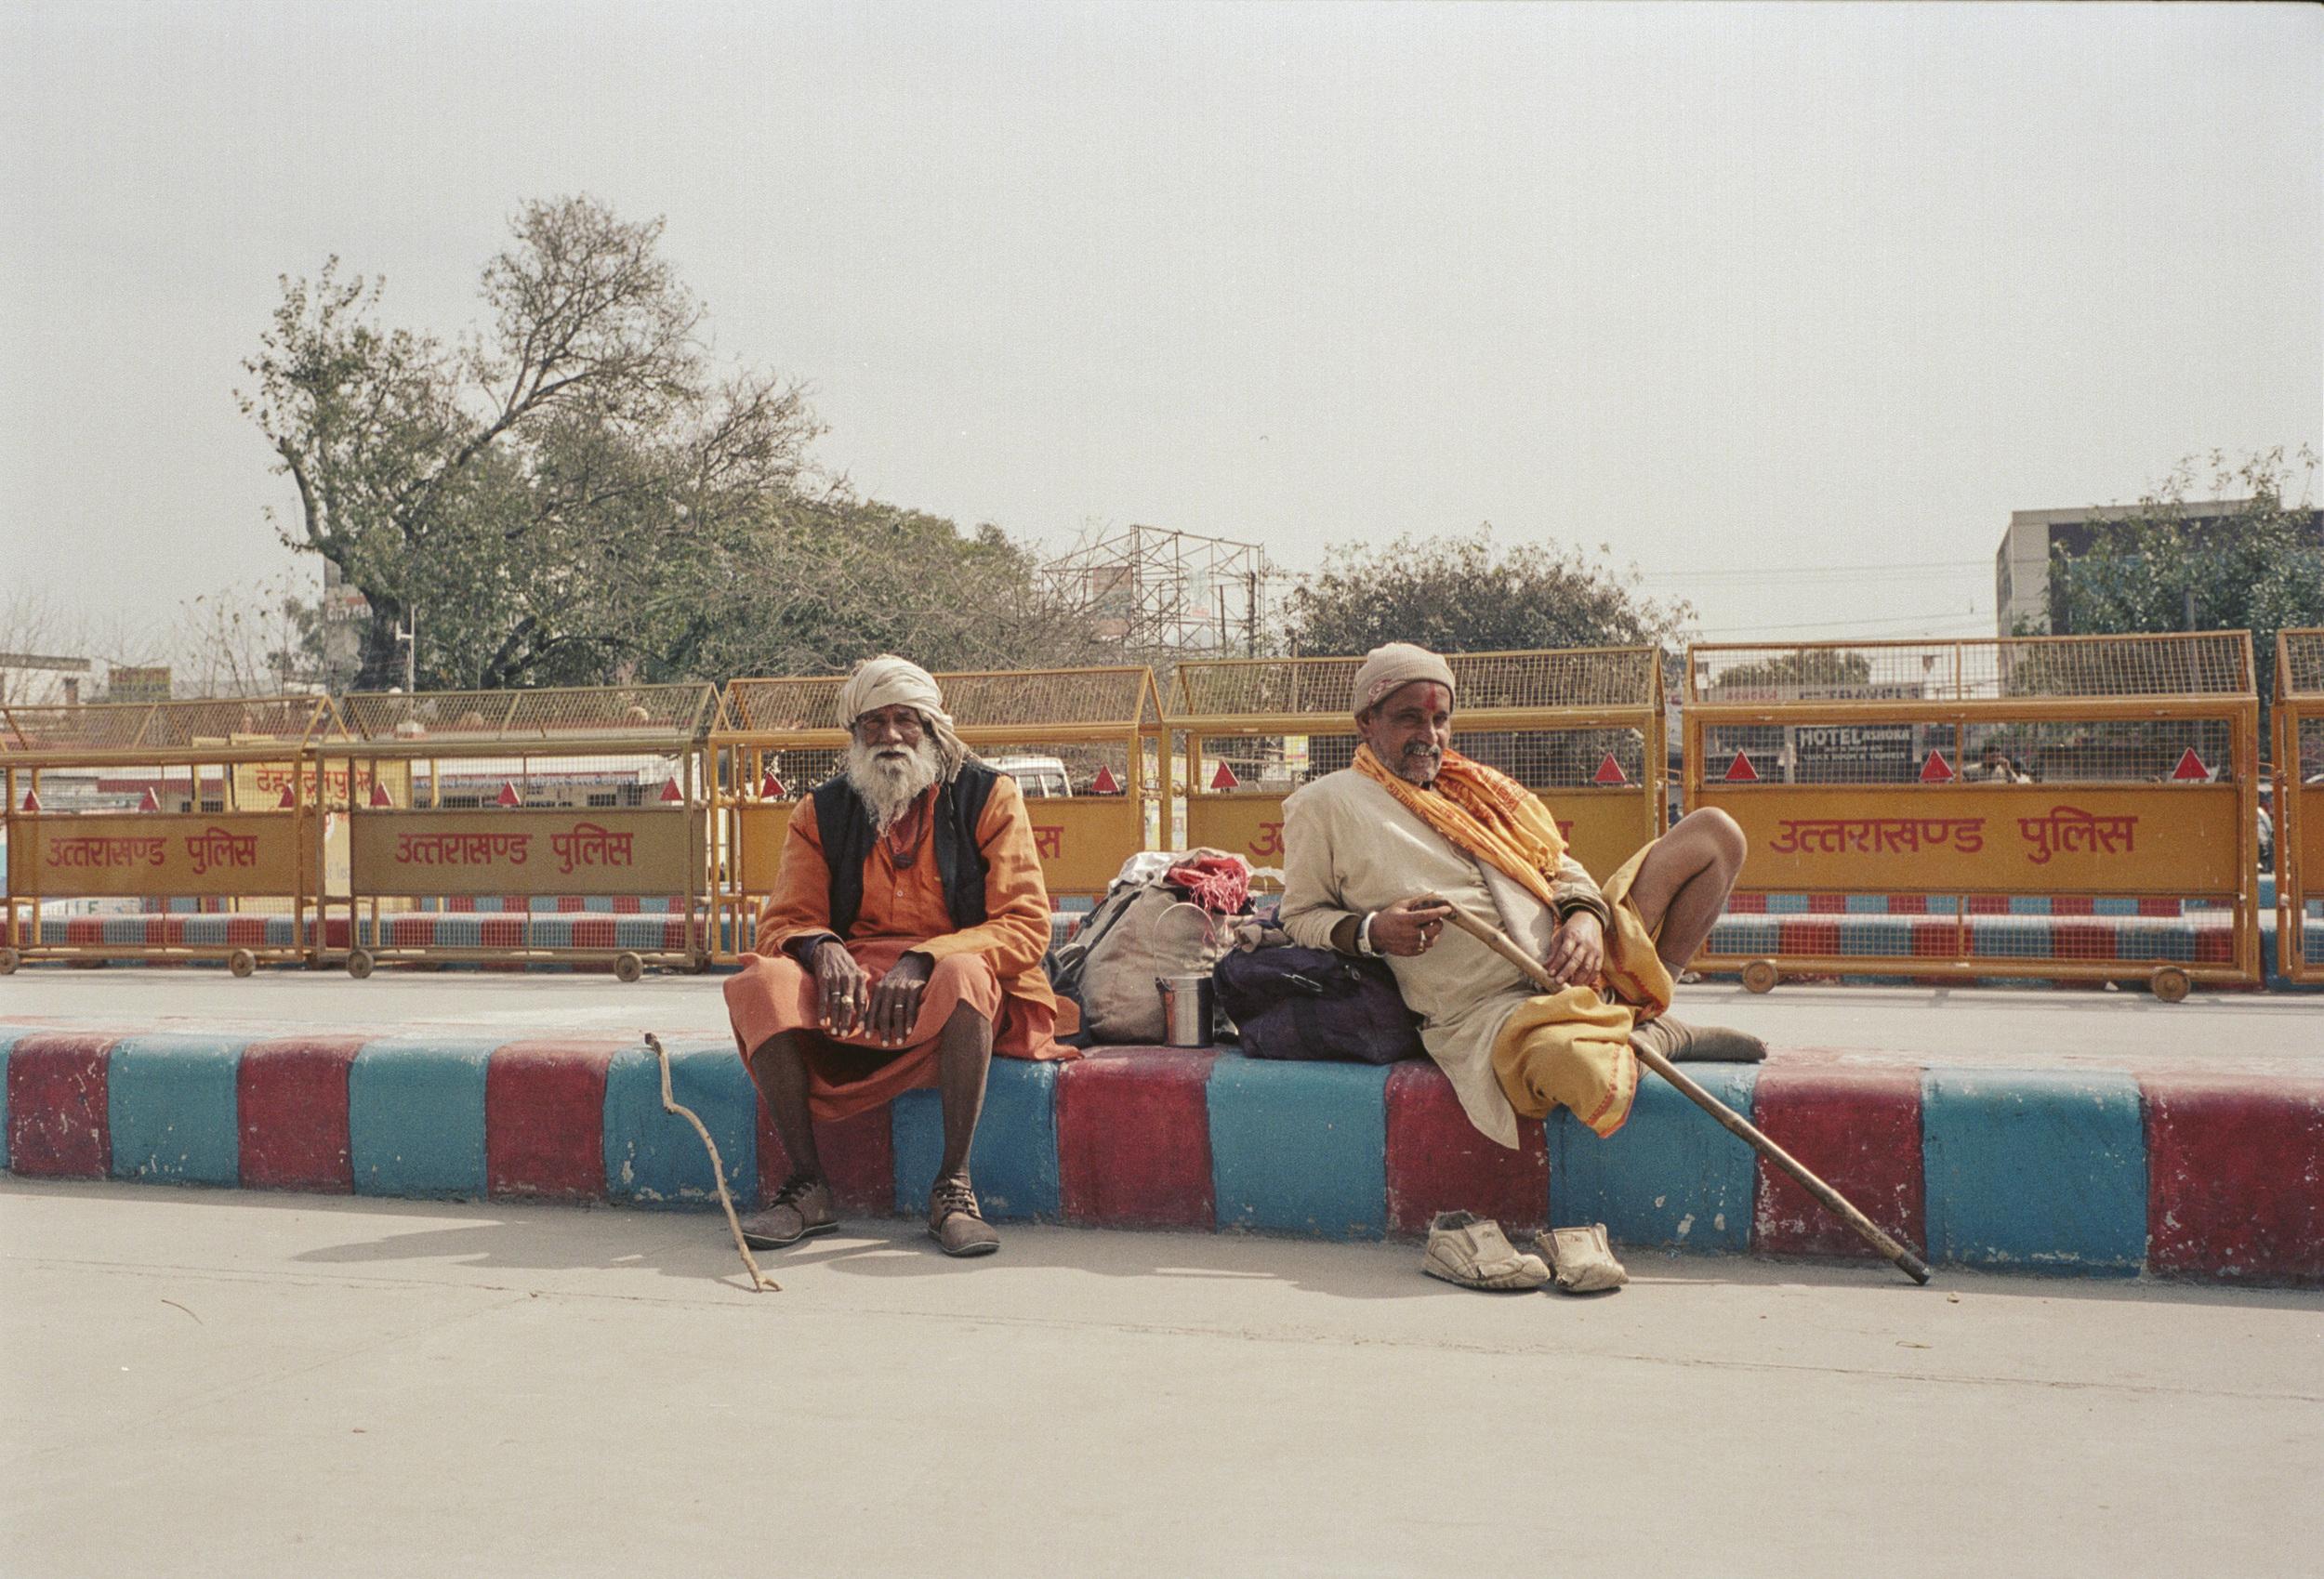 70-F34_Sadhus, Street, Haridwar, India 2016-44.jpg